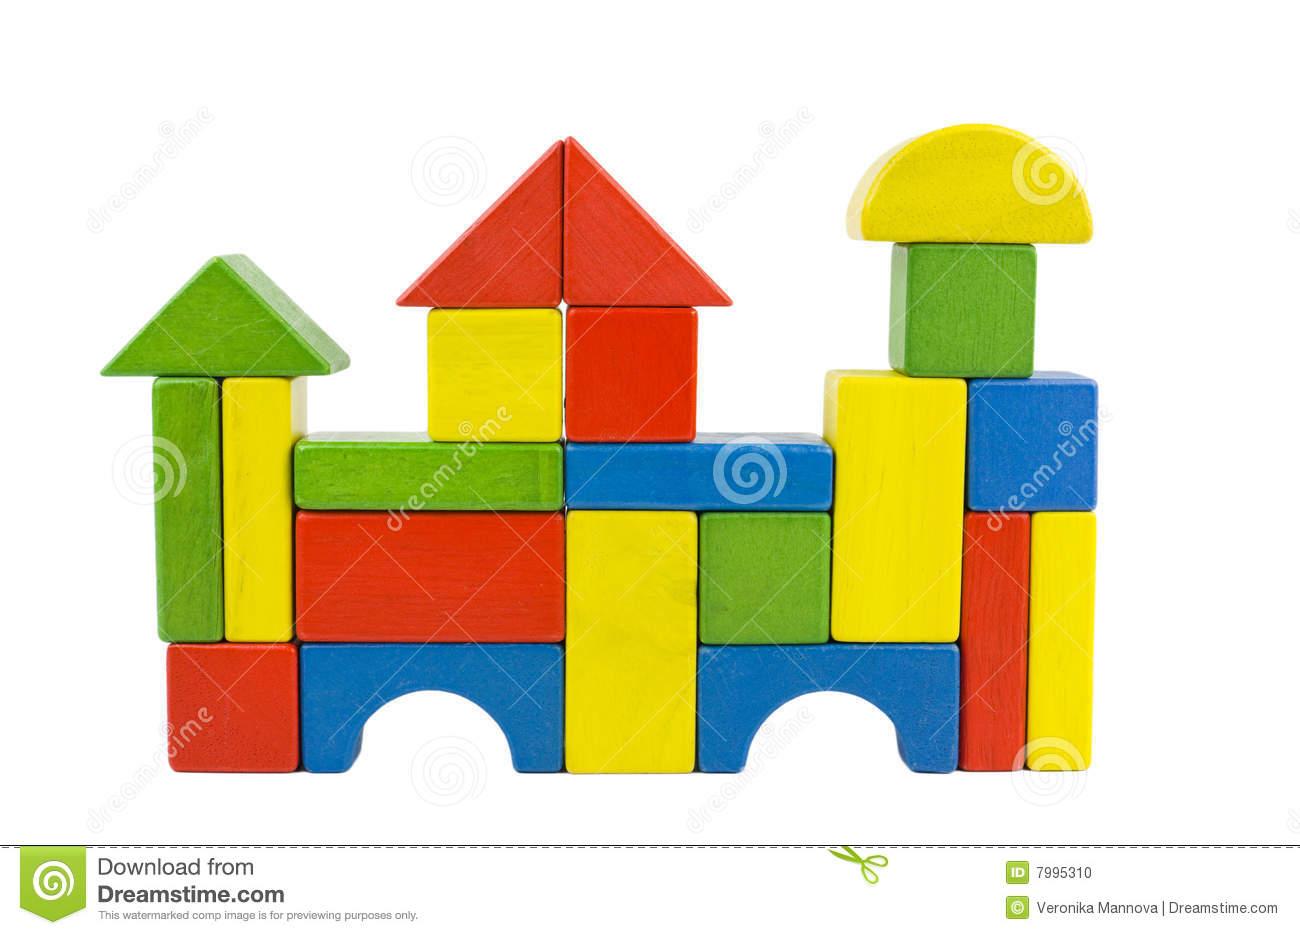 Wooden building blocks clipart jpg freeuse download Building a house with wooden blocks clipart - ClipartFest jpg freeuse download